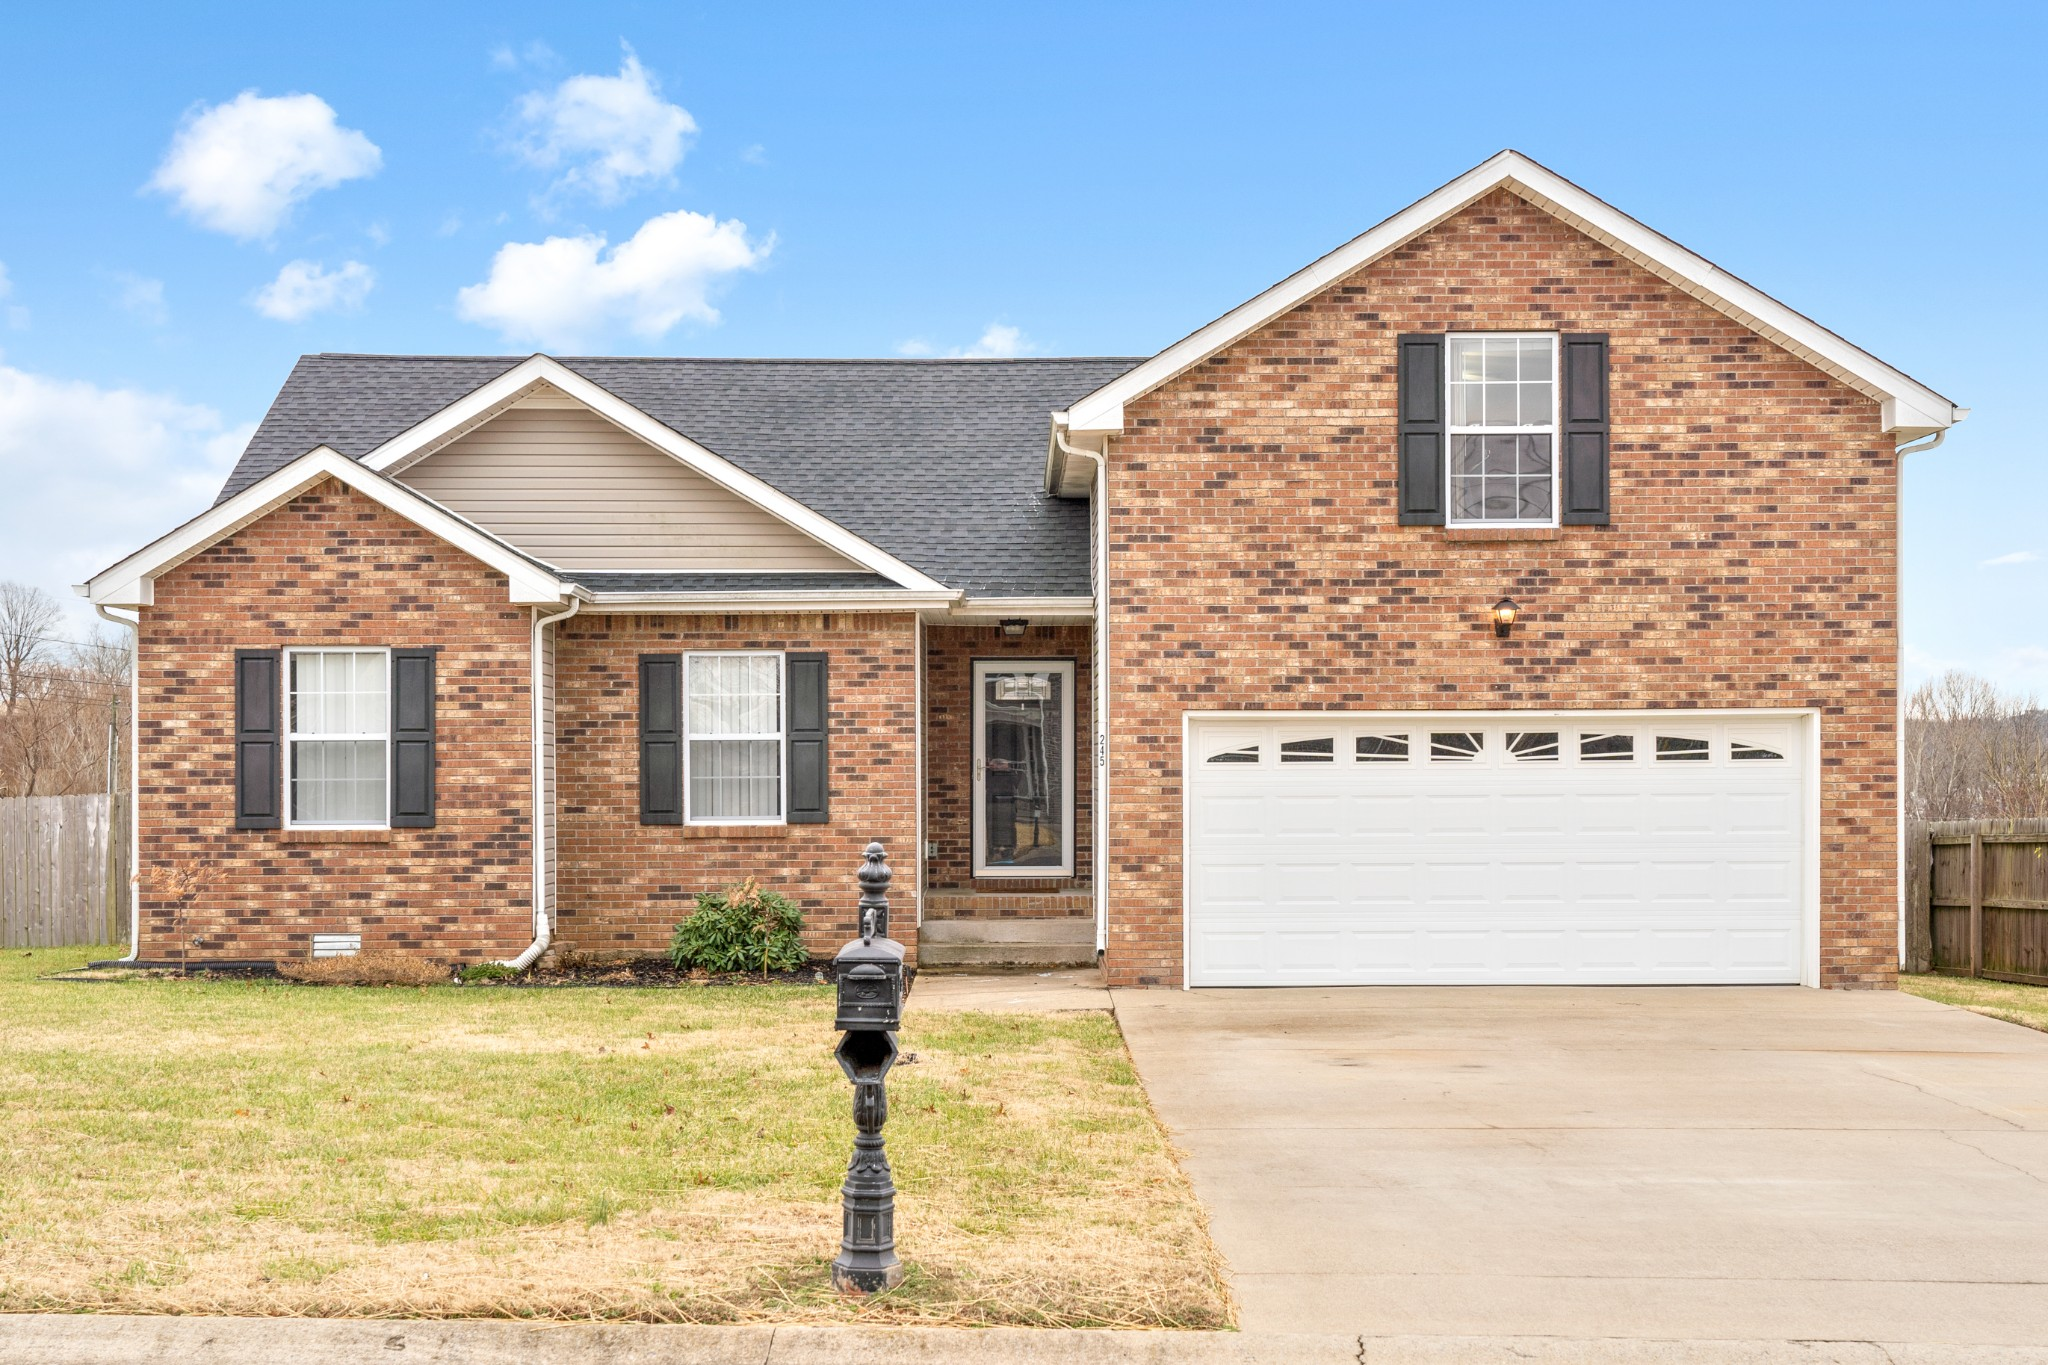 245 Harold Dr, Clarksville, TN 37040 - Clarksville, TN real estate listing